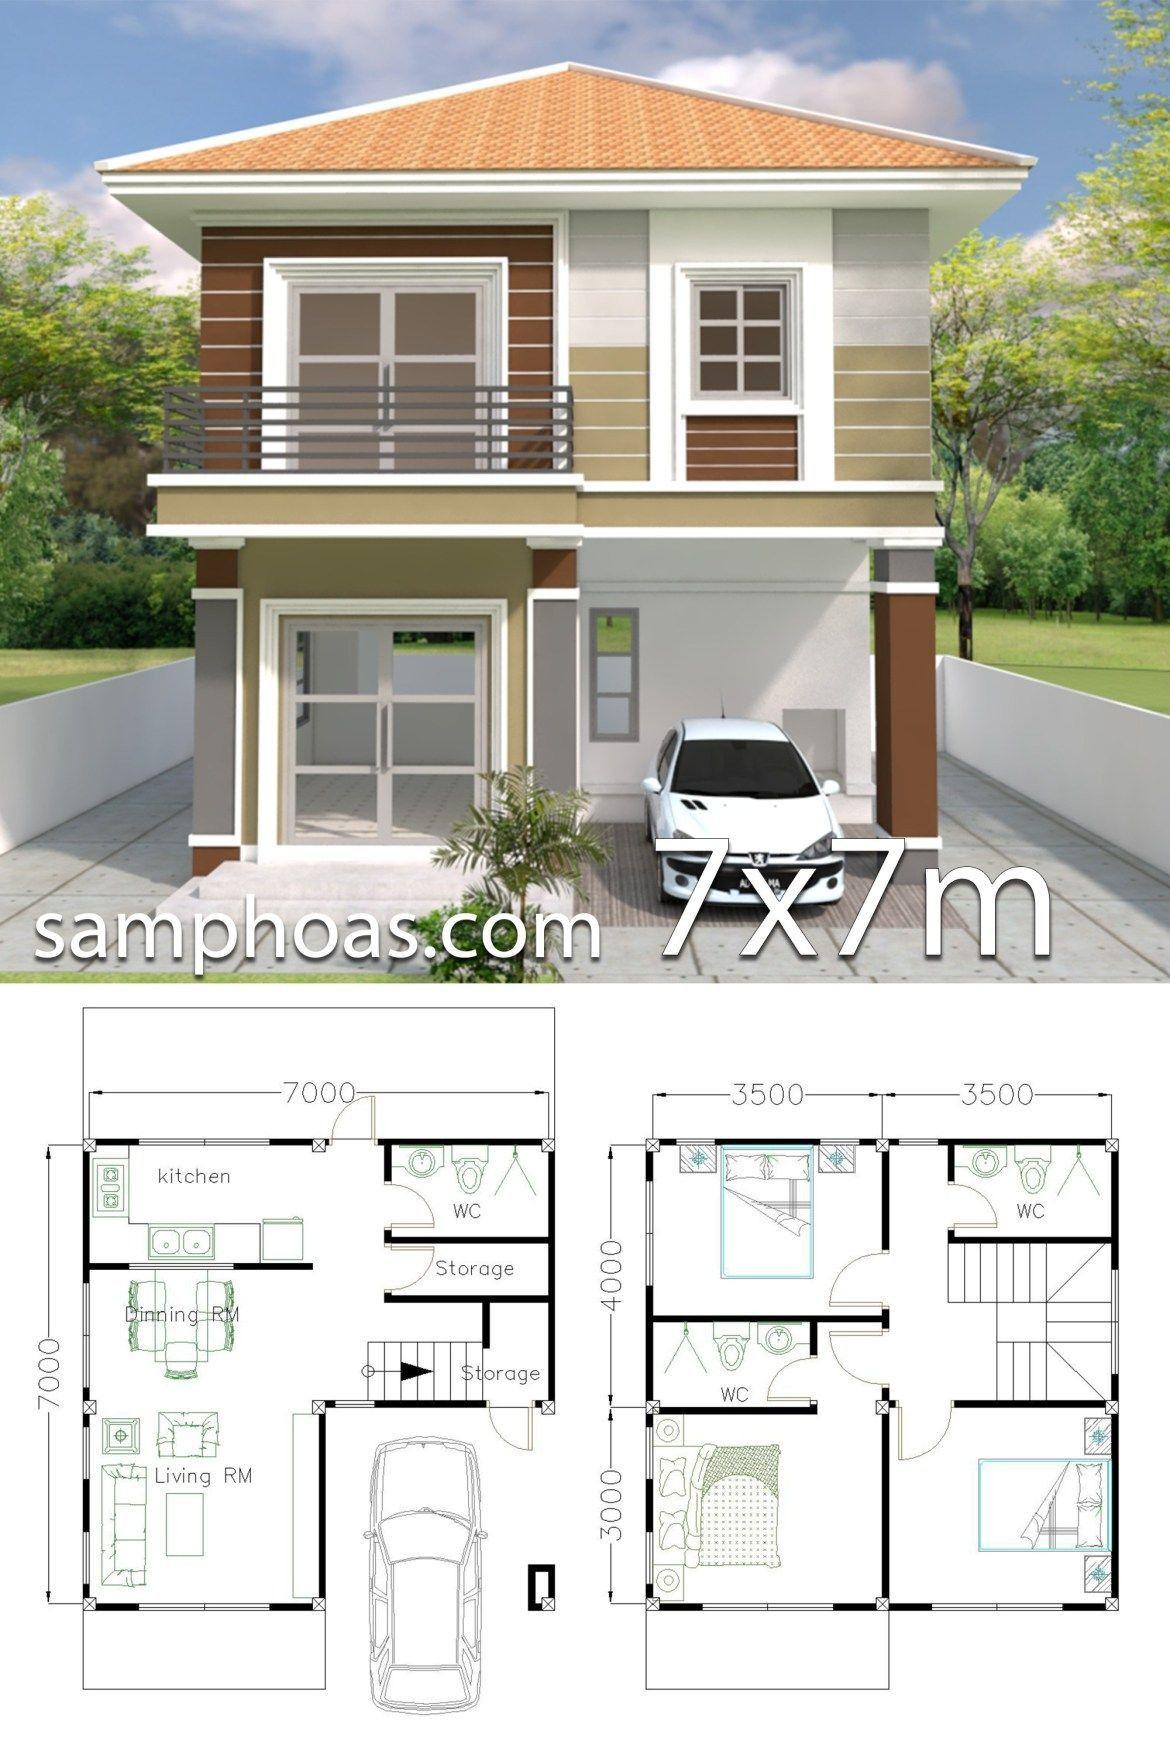 Home Design Plan 7x7m With 3 Bedrooms In 2021 Duplex House Design Small Modern House Plans Small House Design Plans